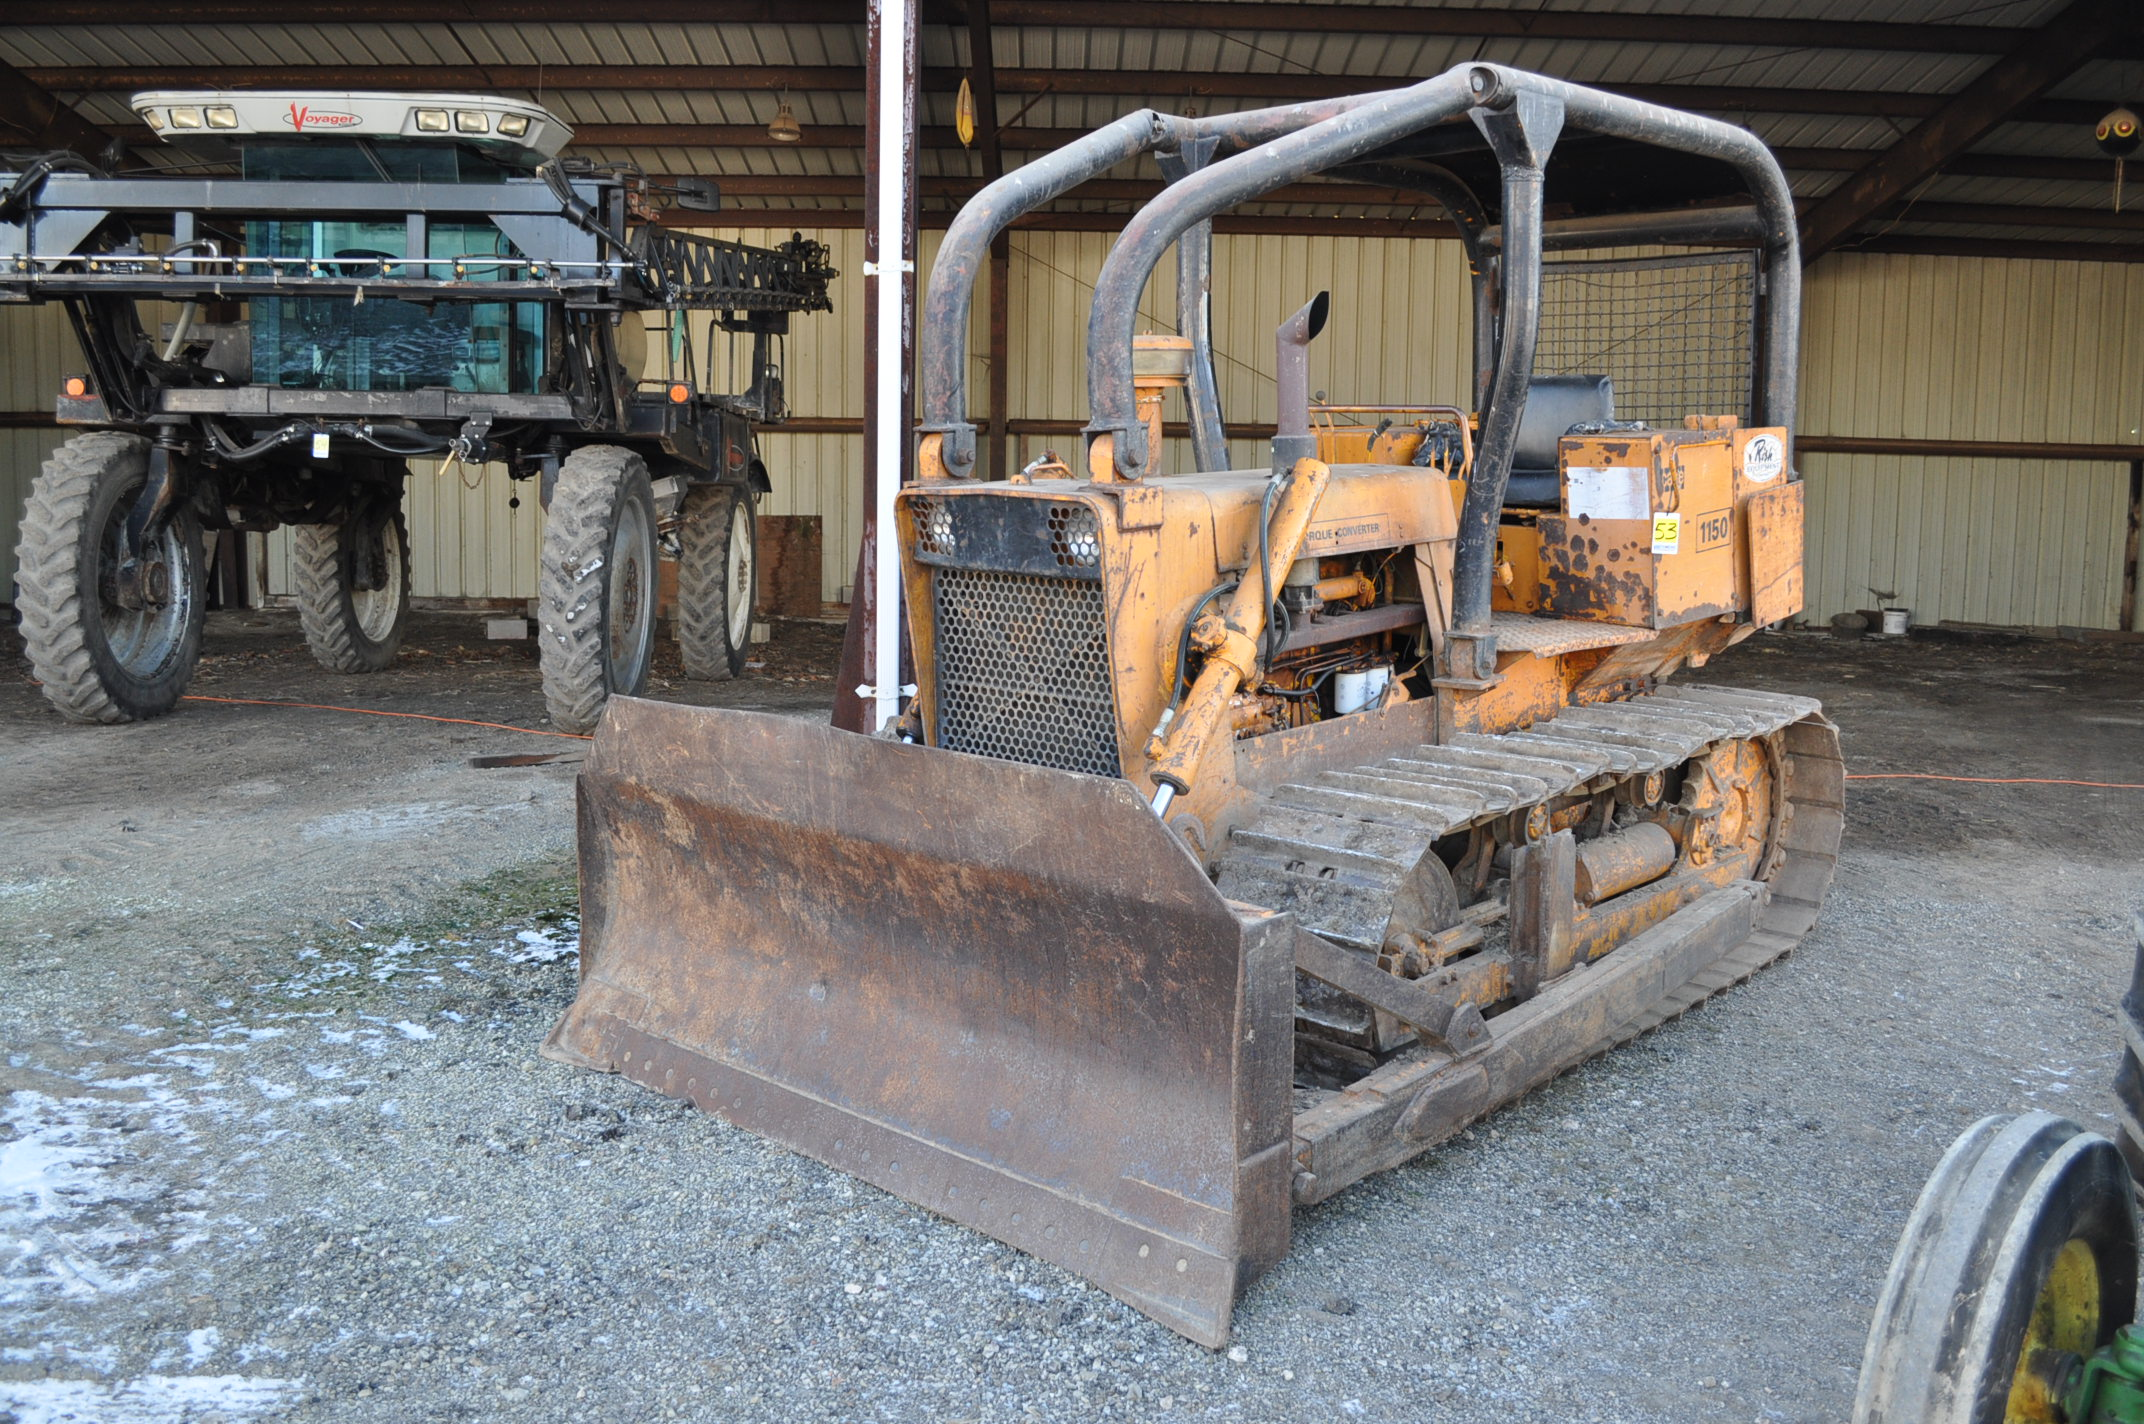 Case 1150 dozer, 8' 4 way blade, rear hitch, diesel, shows 1250 hrs, hrs unkown, SN missing